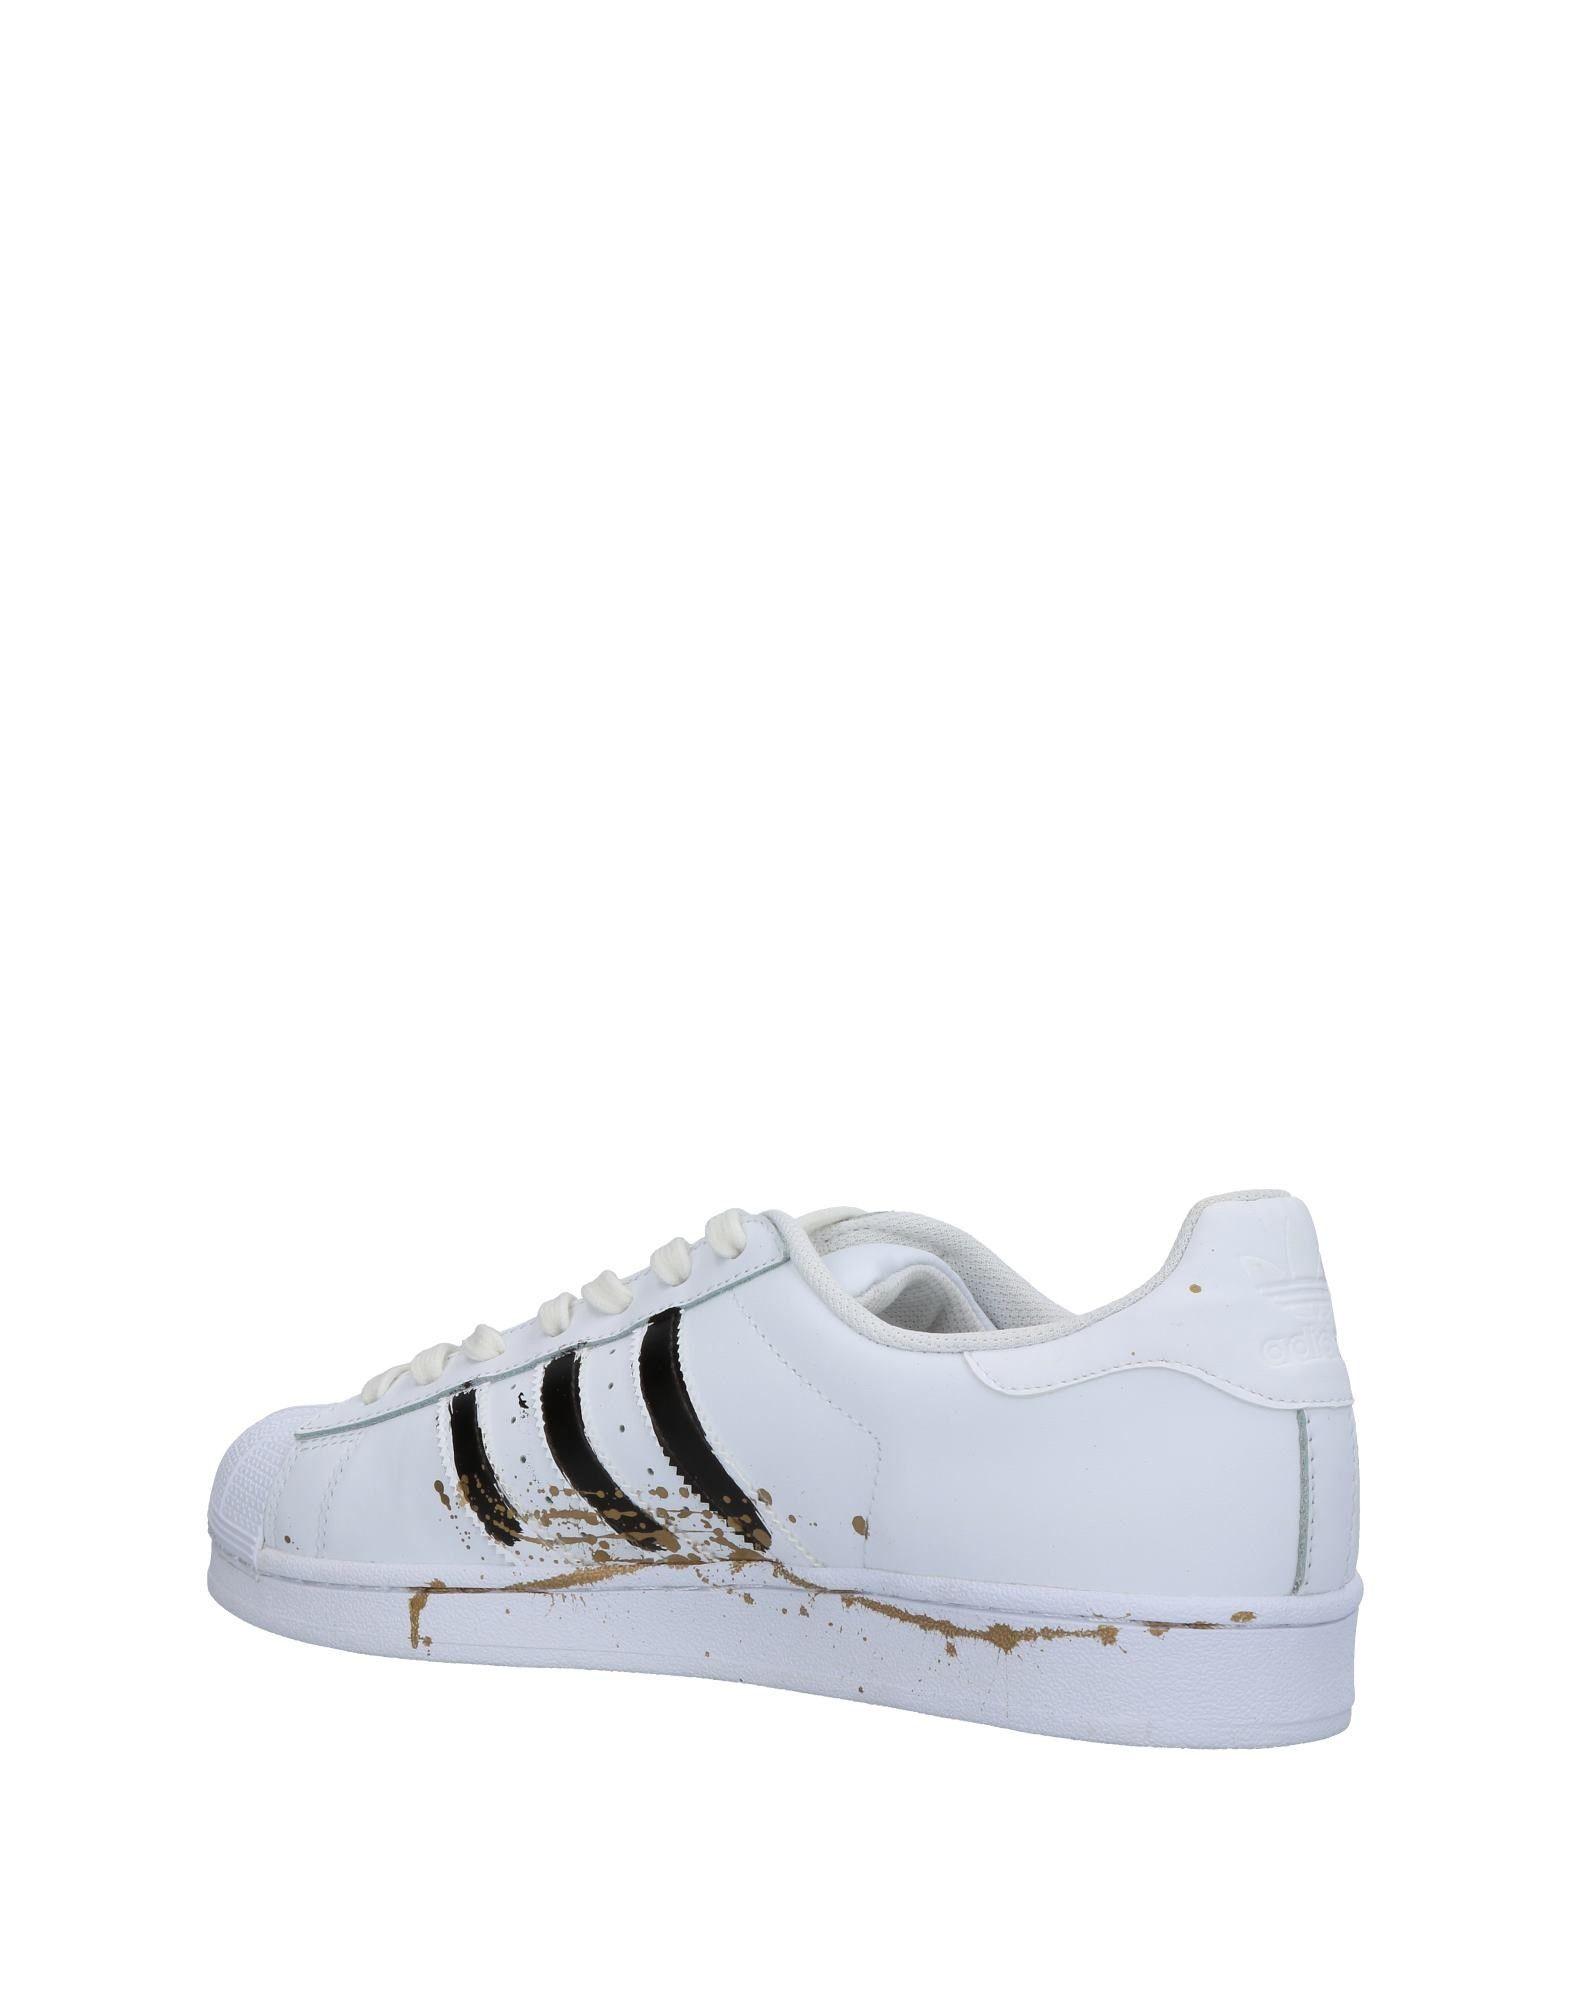 Rabatt echte Schuhe  Adidas Originals Sneakers Herren  Schuhe 11402266NI 37ff88